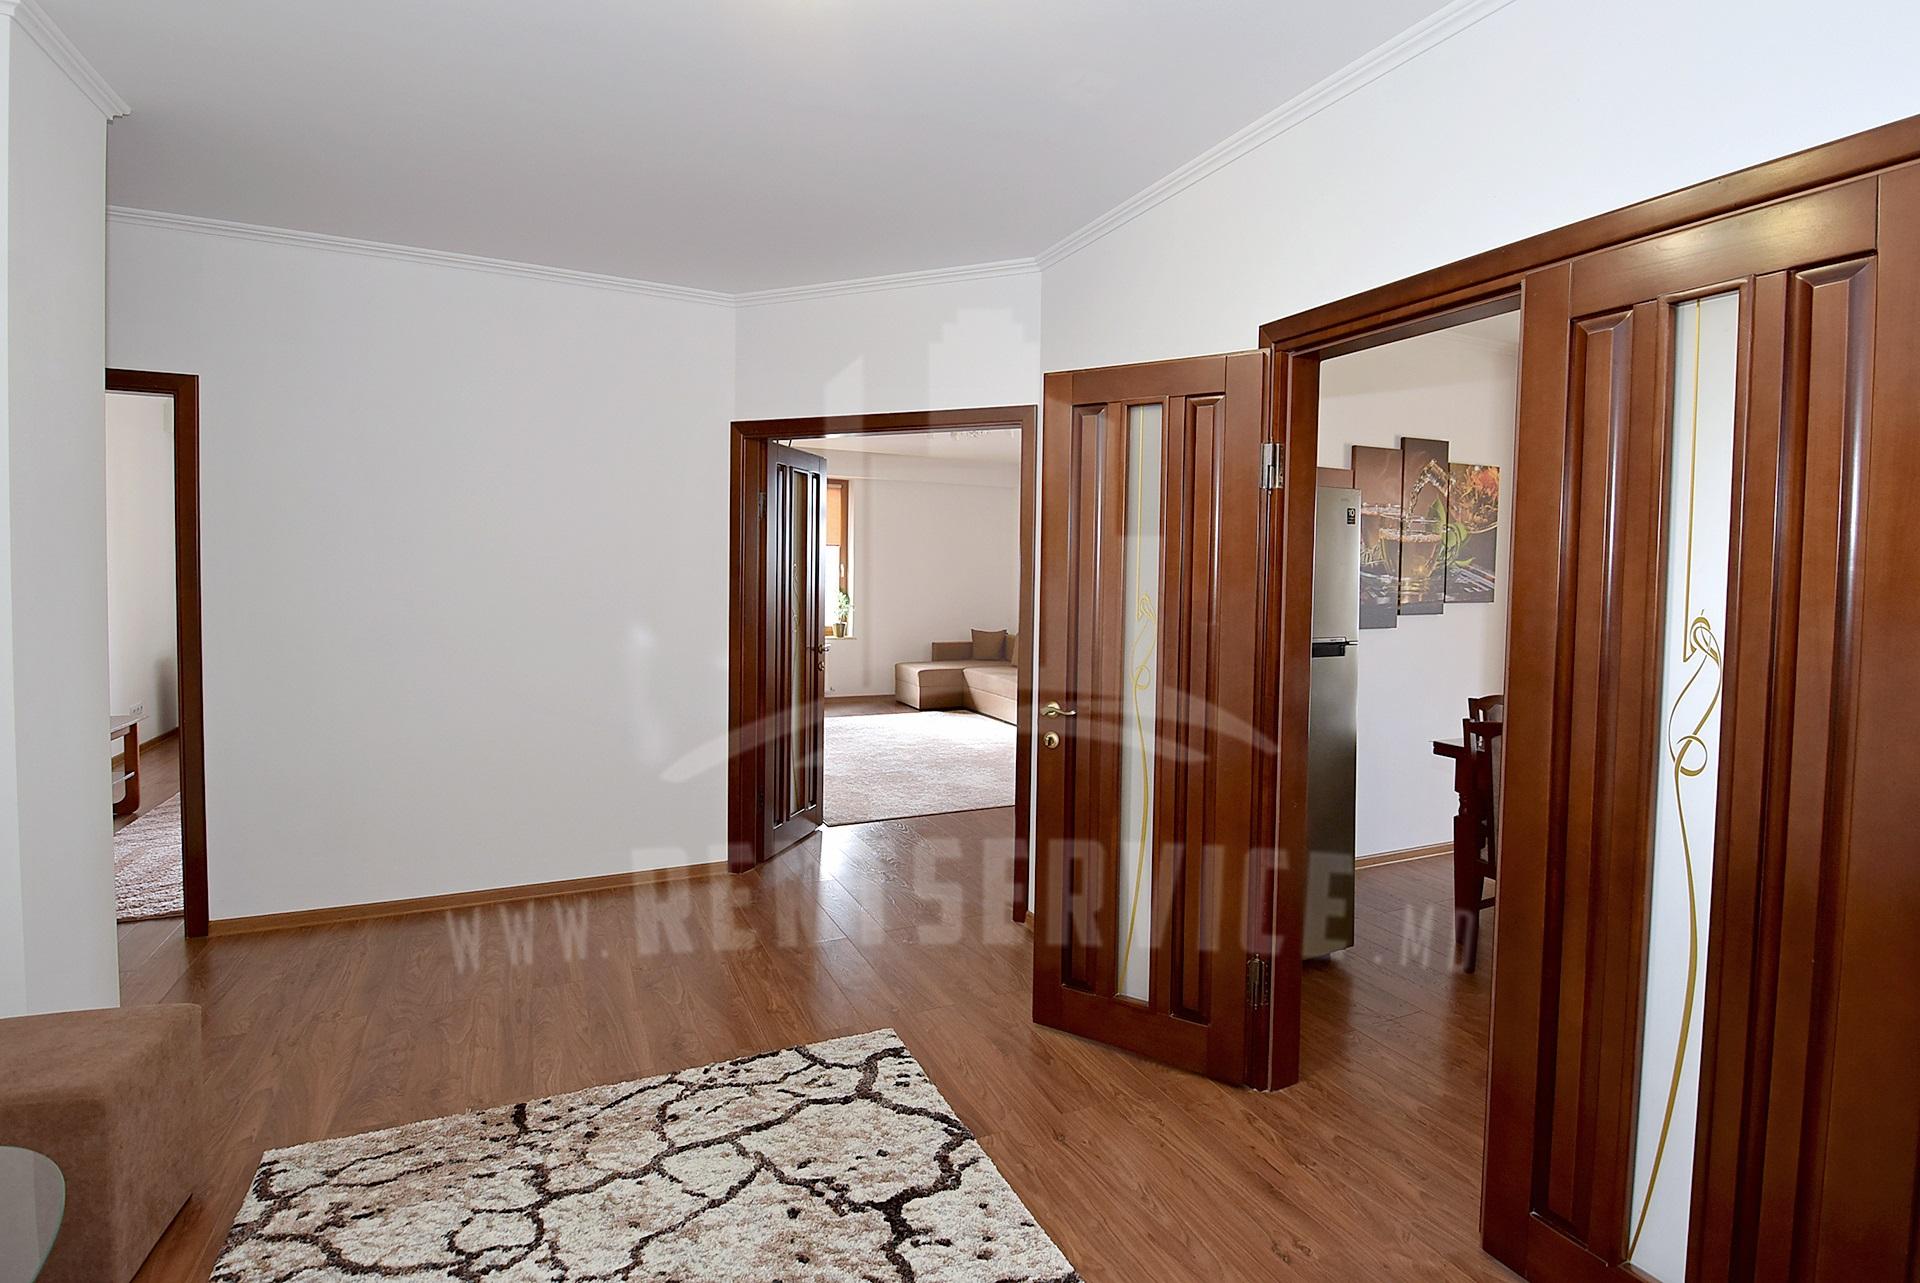 287_apartment_9.JPG